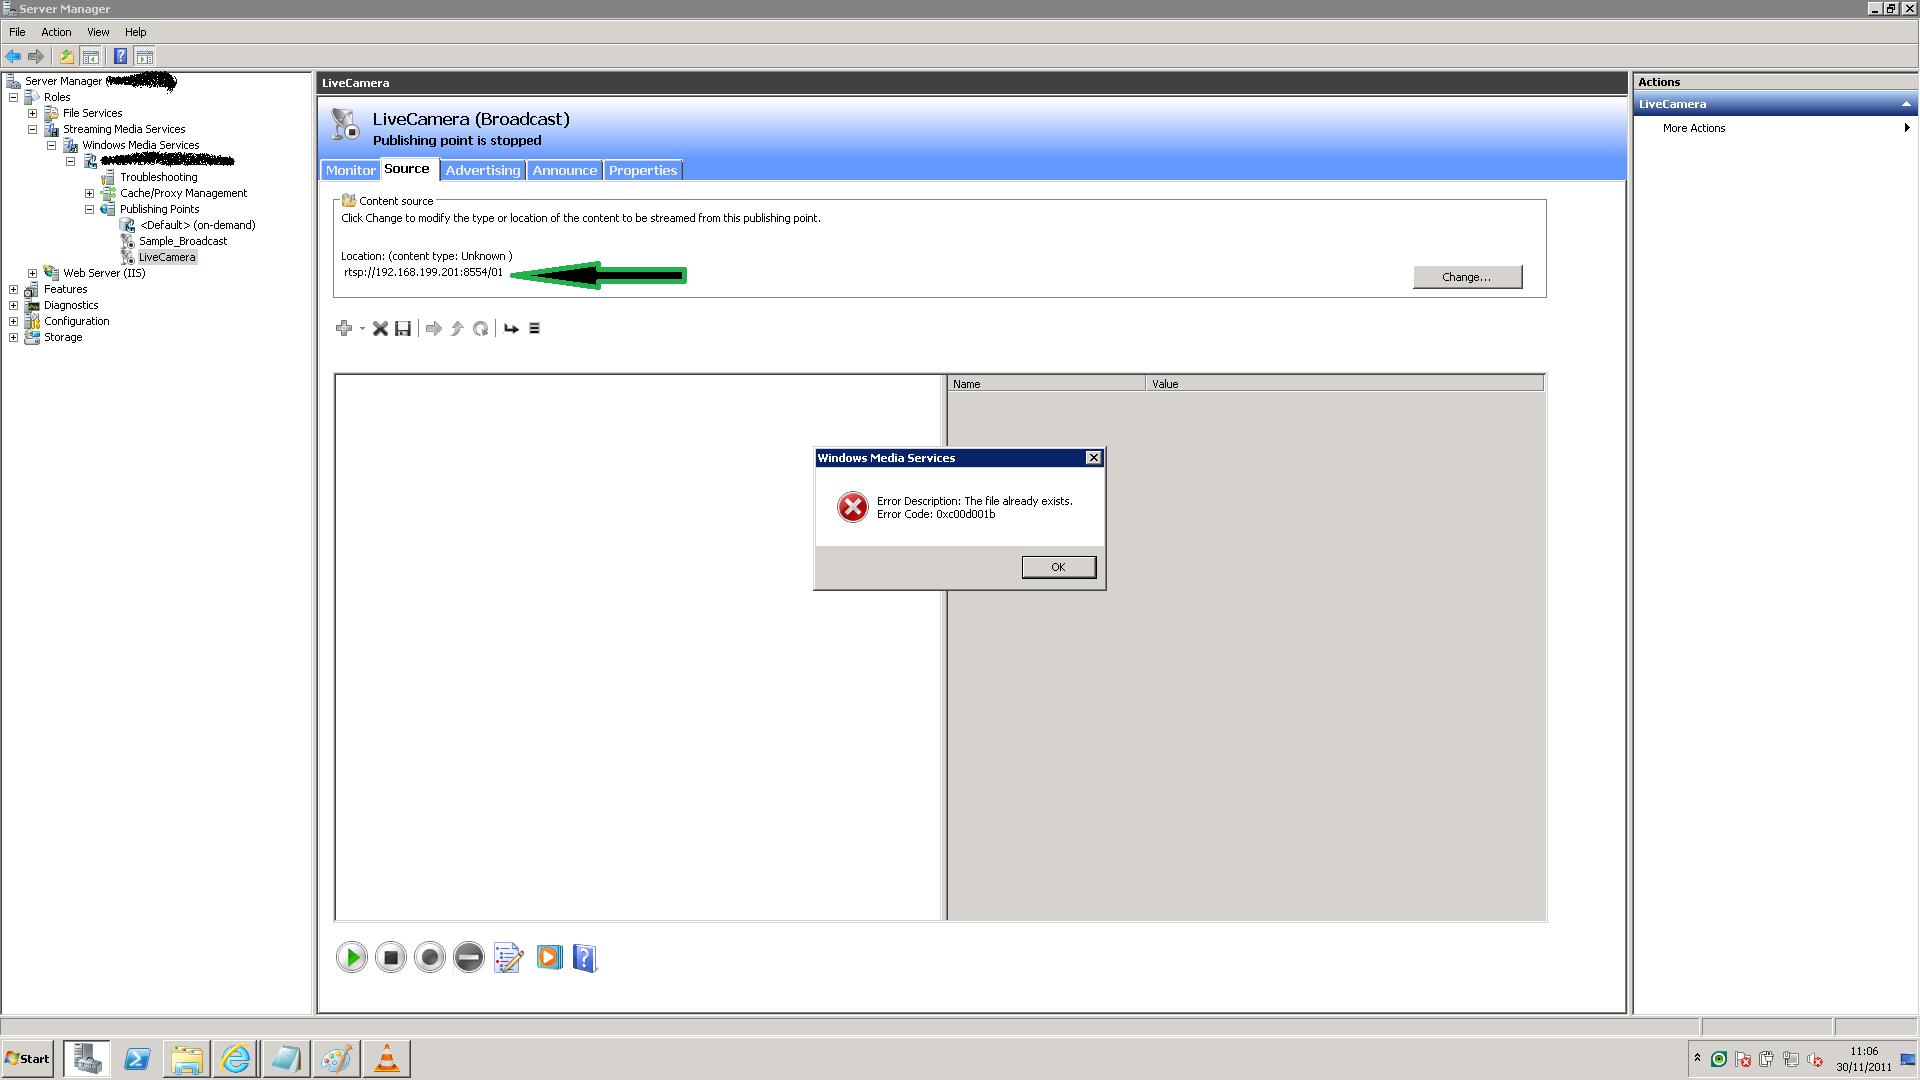 Windows Media Server Did not Accept HTTP or RTSP streams???